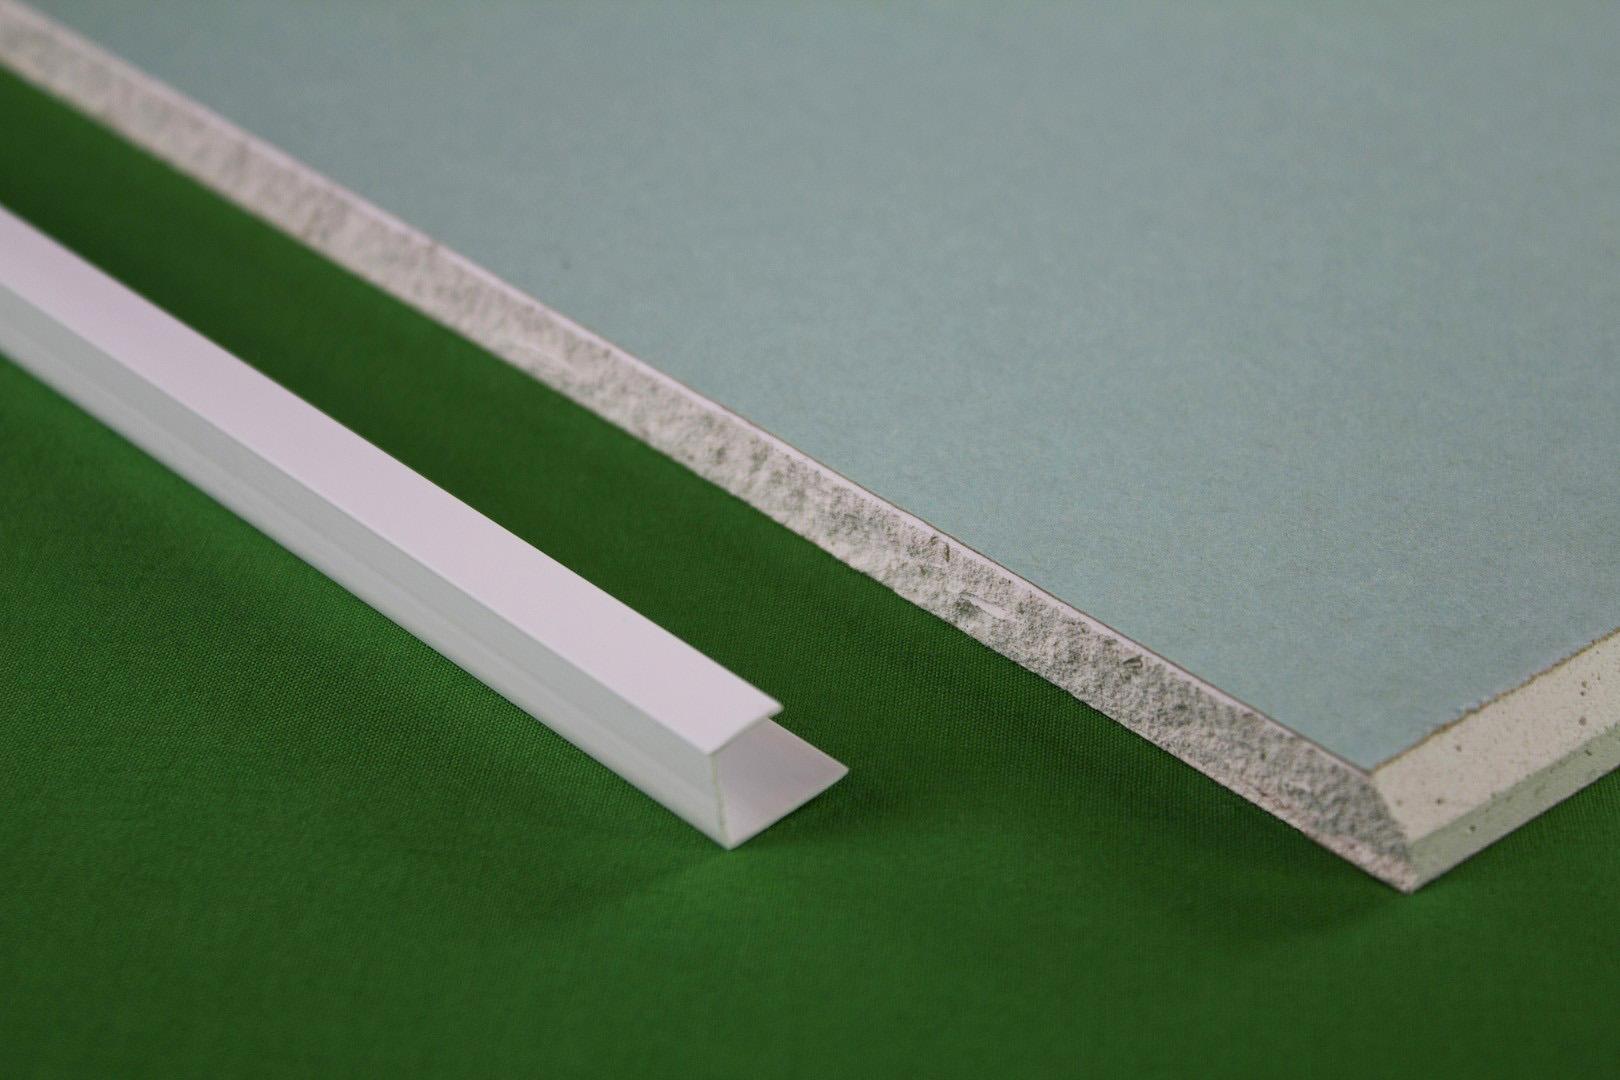 10 Meter PVC Kantenprofil Für Gipskarton Platten Rigips 12